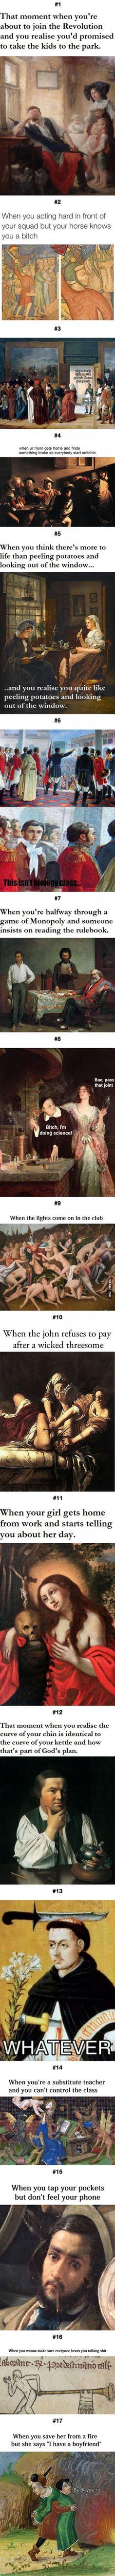 Best Of Classical Art Memes!